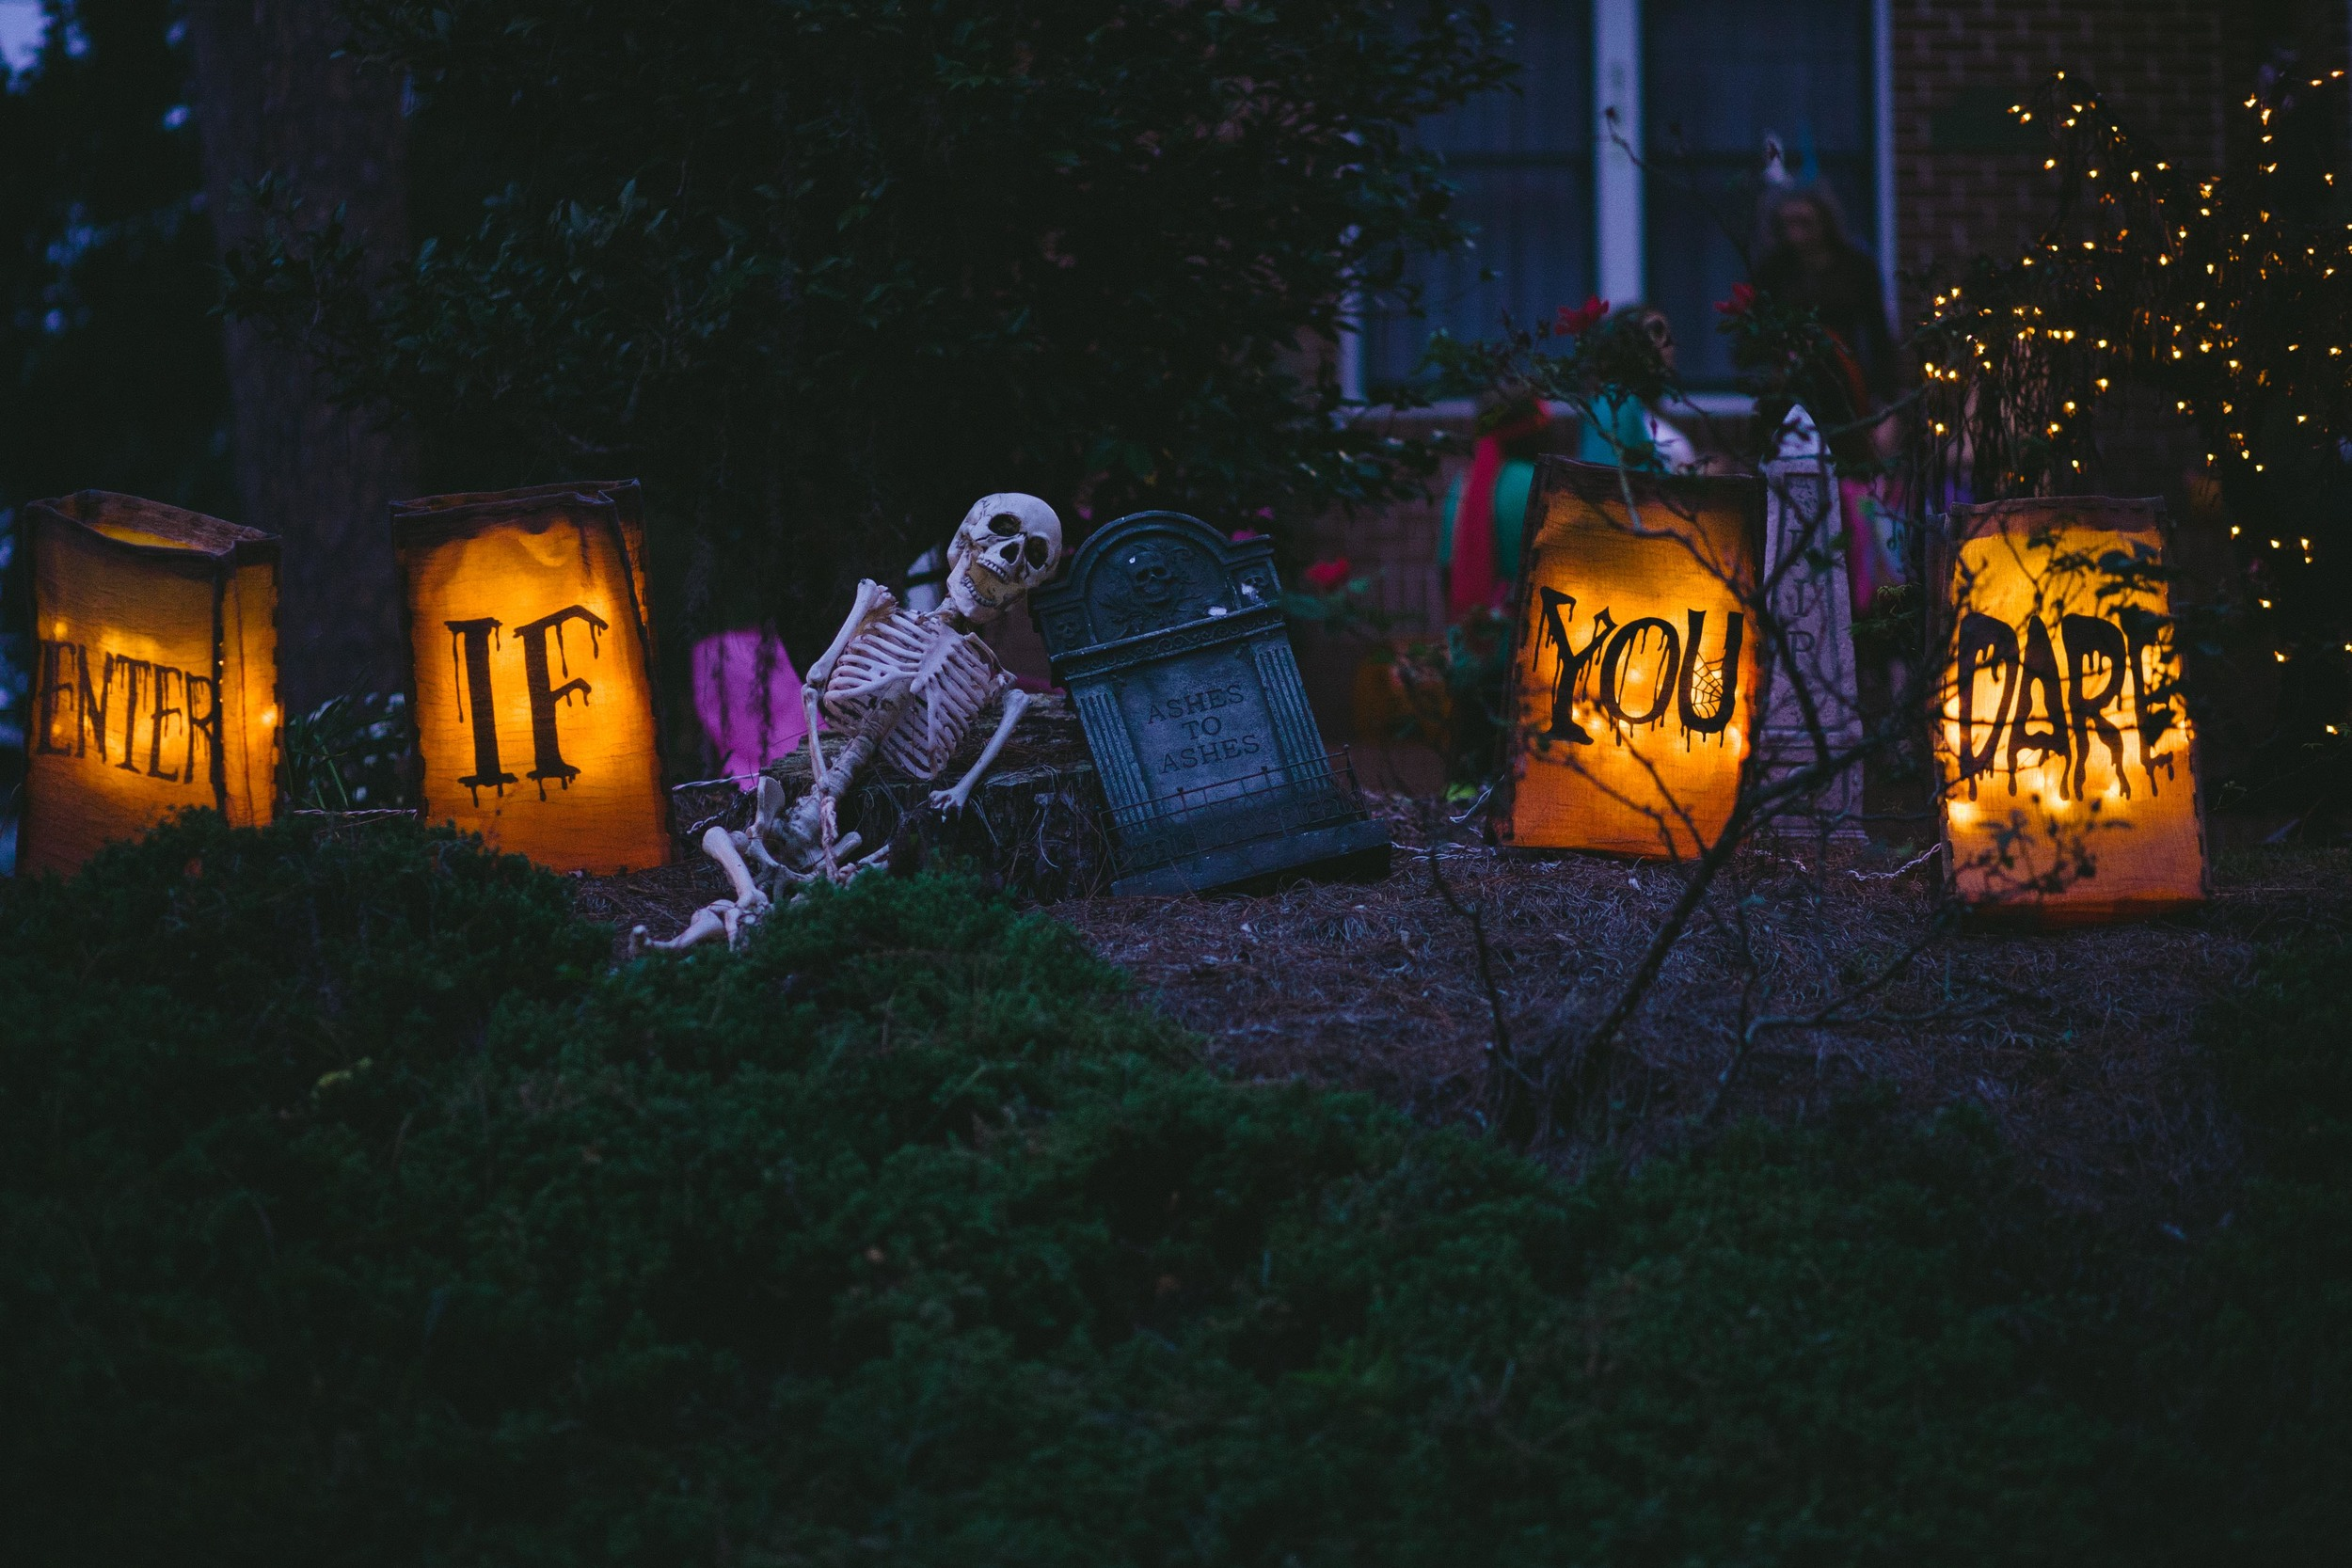 tallahassee-photography-halloween-8809.jpg